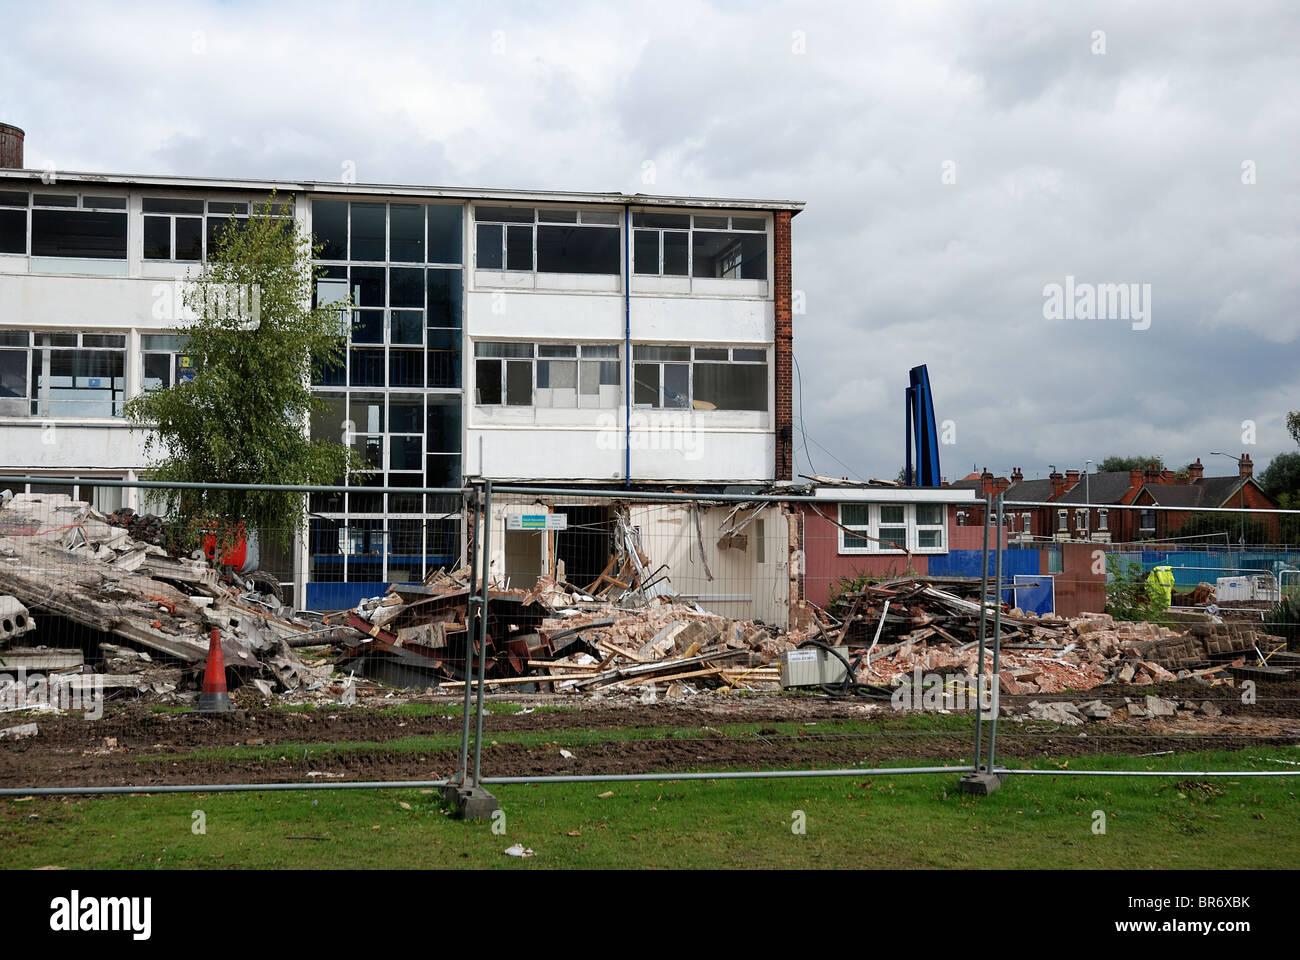 Nottingham school being demolished river leen comprehensive england uk - Stock Image